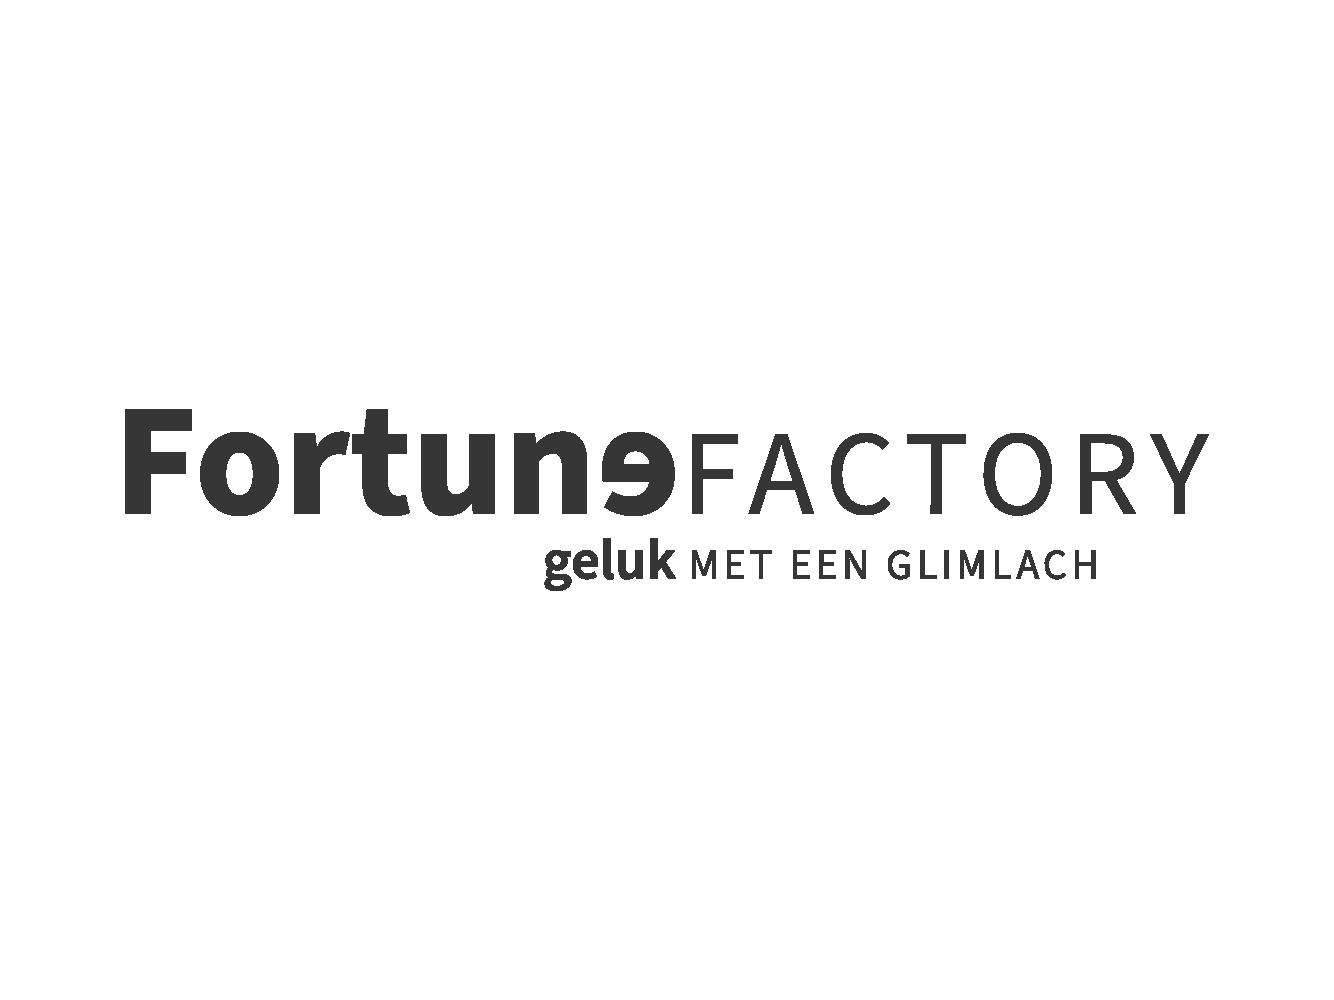 Fortune Factory Papendrecht